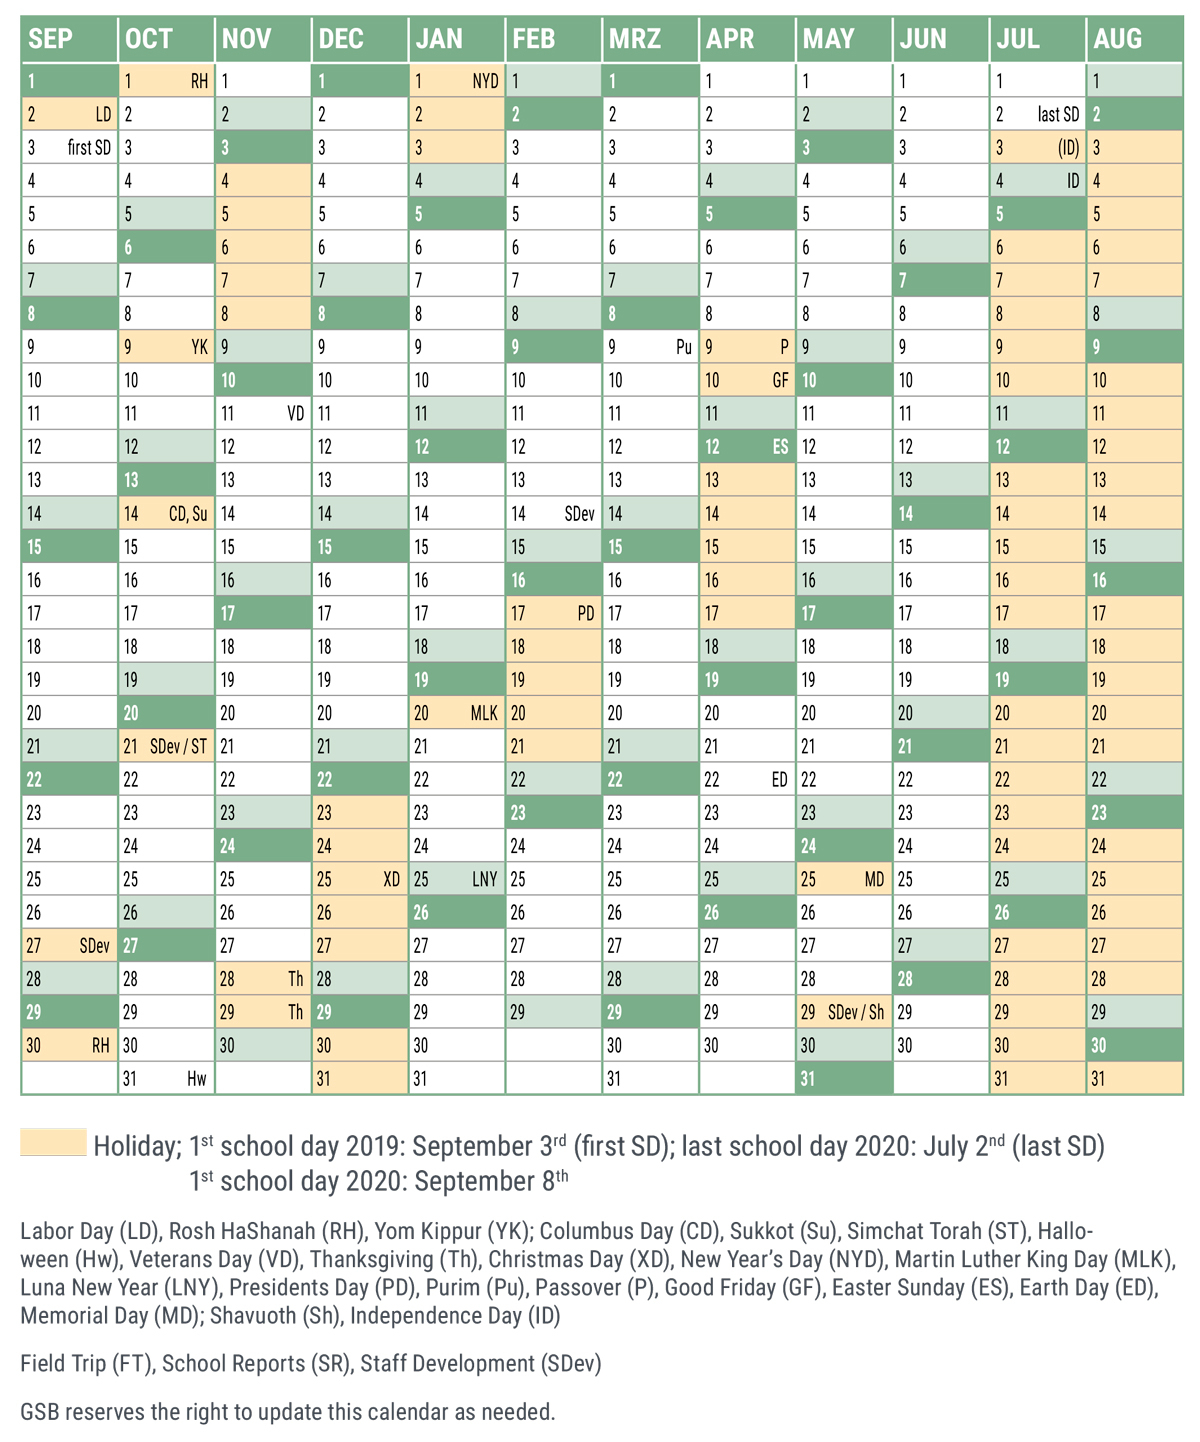 Nassau Cc 19 20 Calendar | Printable Calendar 2020 2021 Throughout Clackamas County Court Calendar